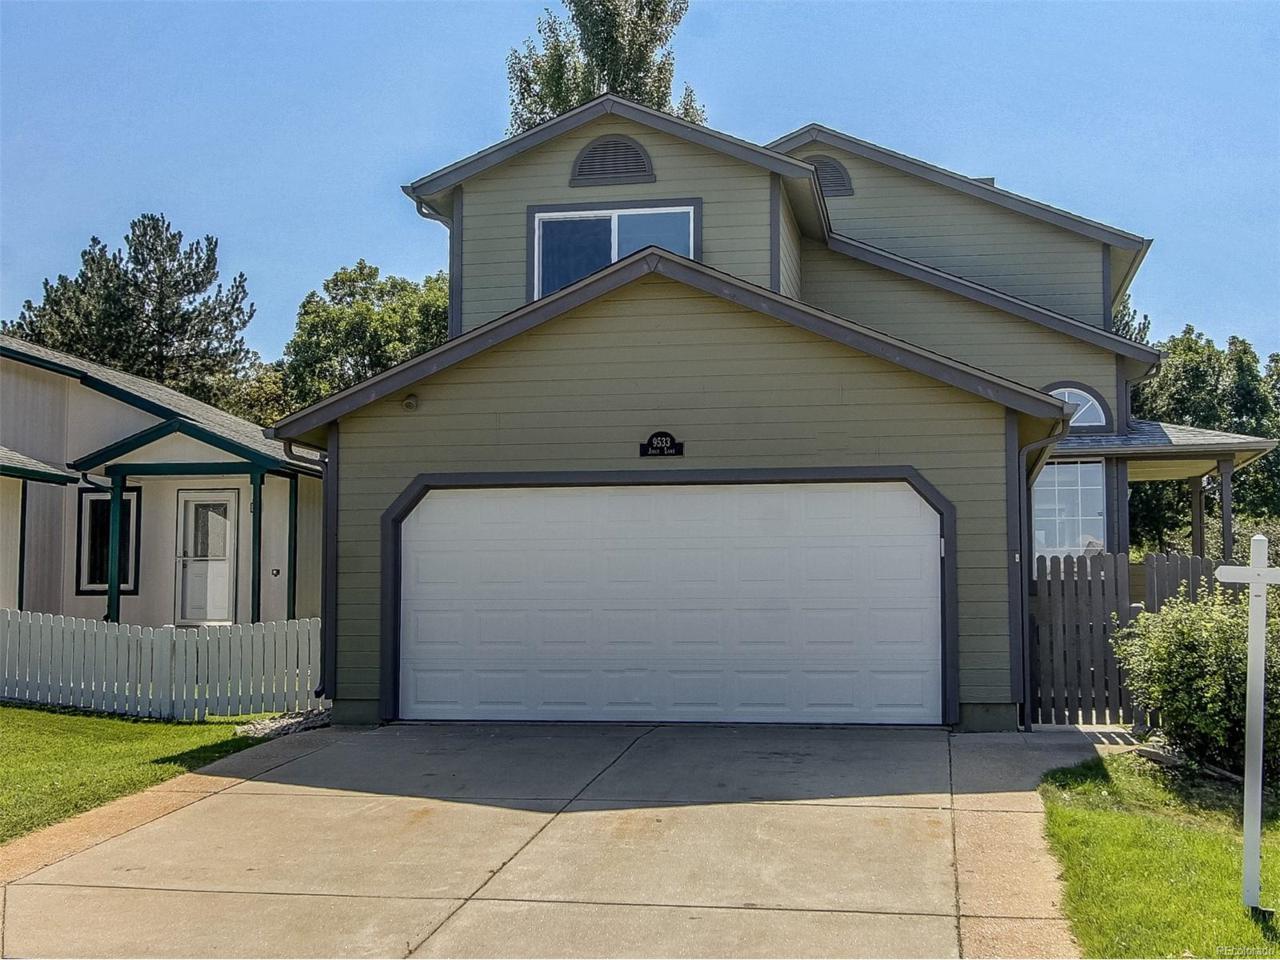 9533 Joyce Lane, Highlands Ranch, CO 80126 (MLS #7843946) :: 8z Real Estate